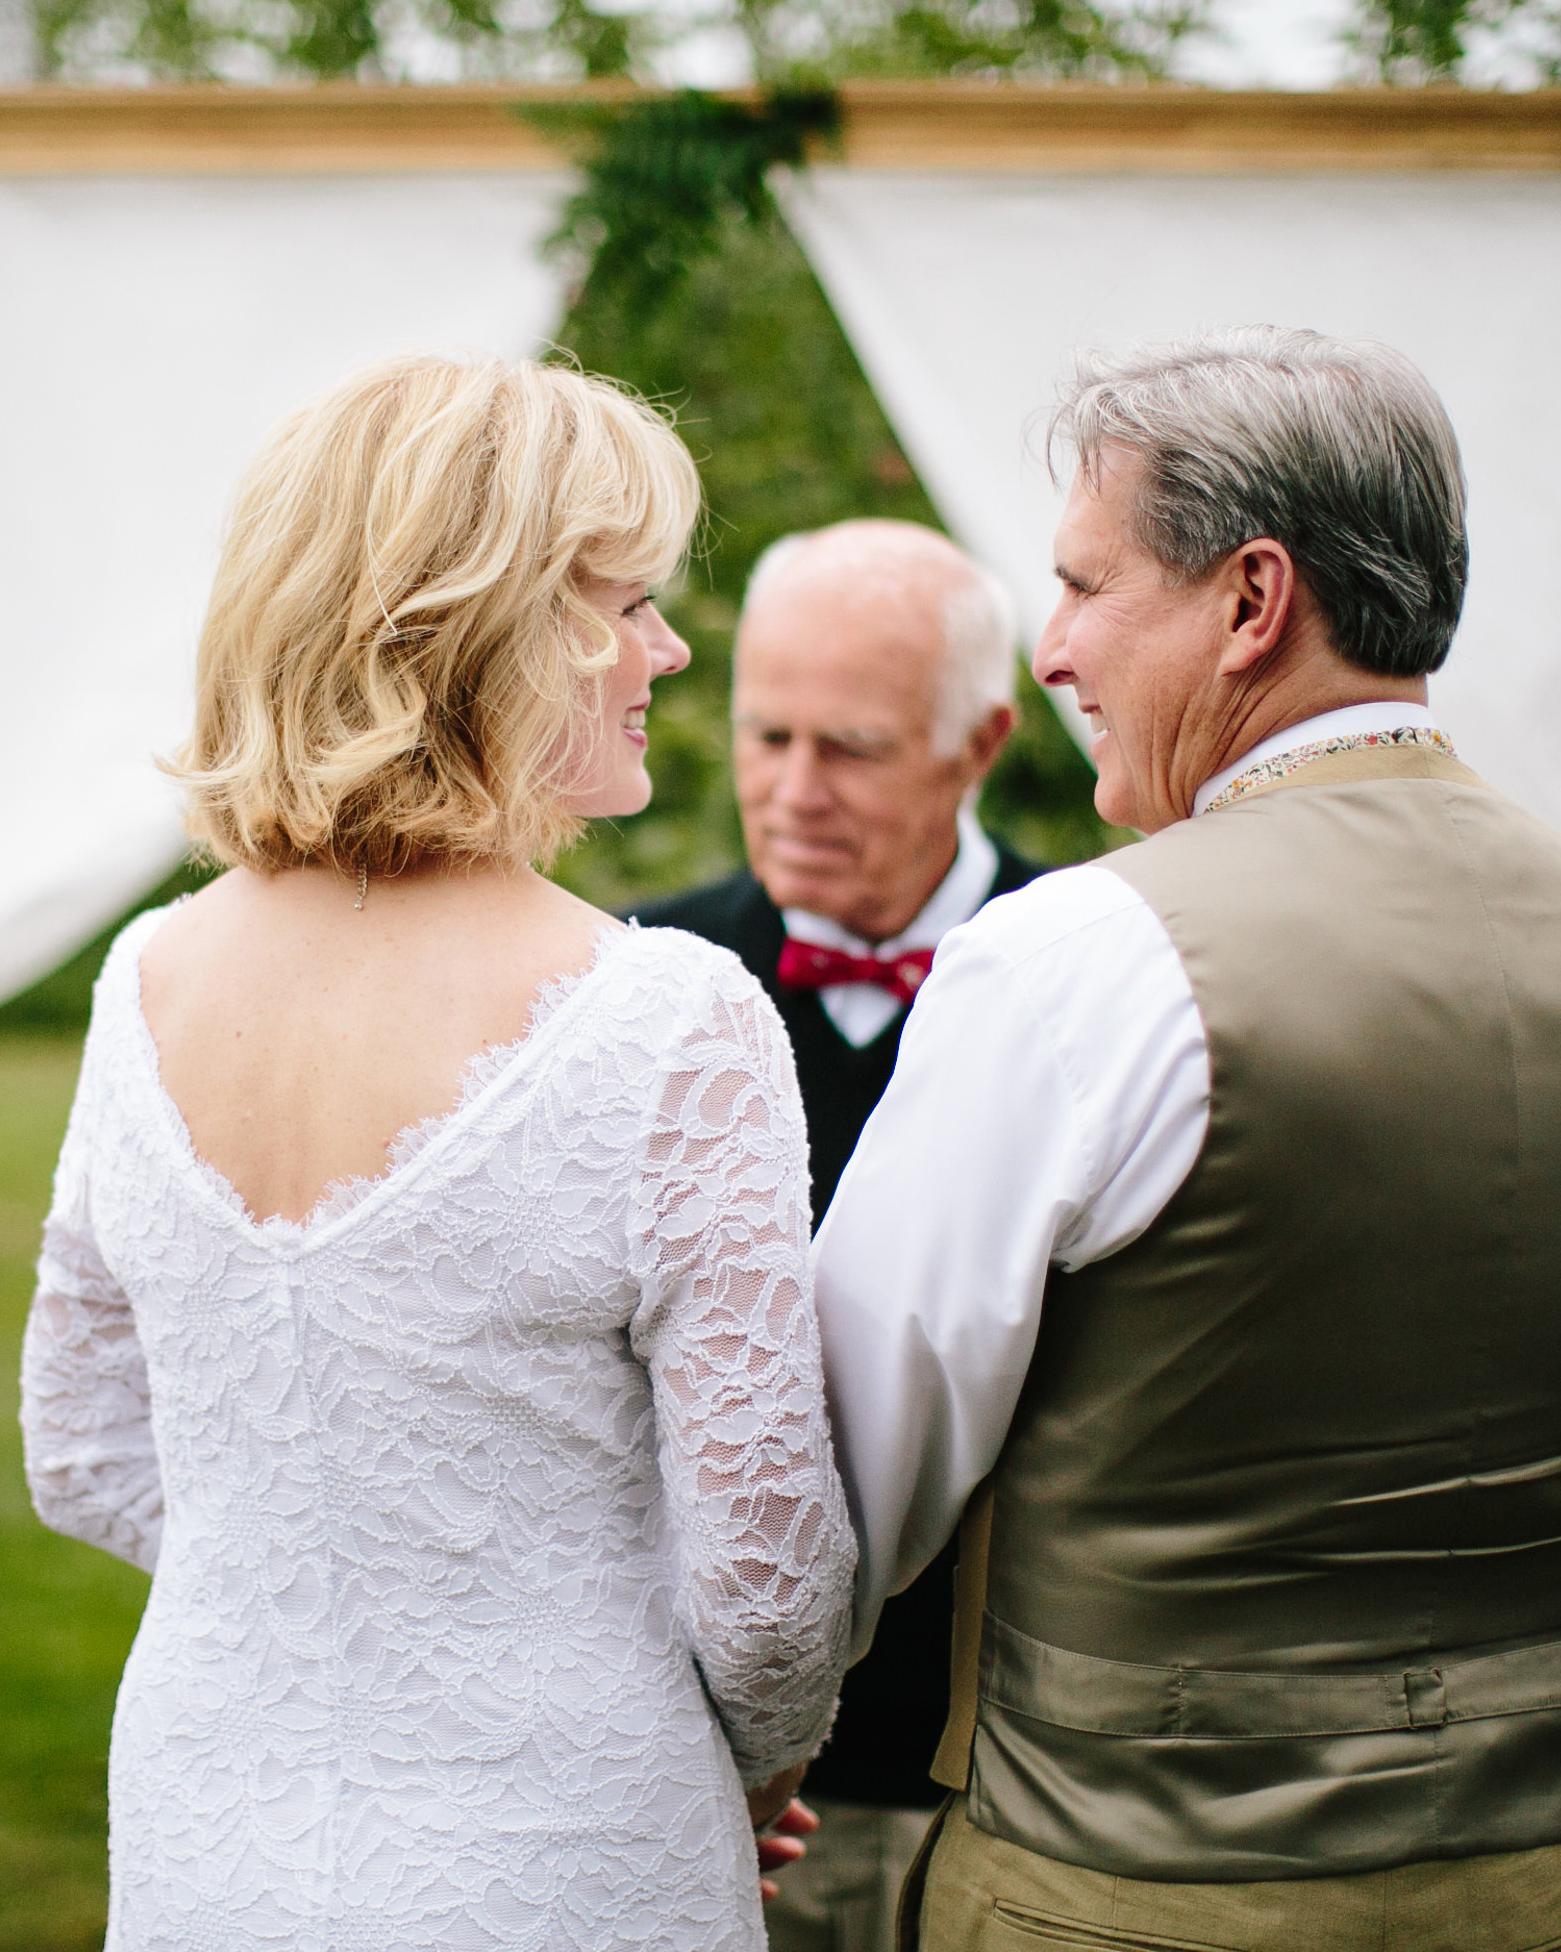 sandy-dwight-wedding-ceremony1-0514.jpg